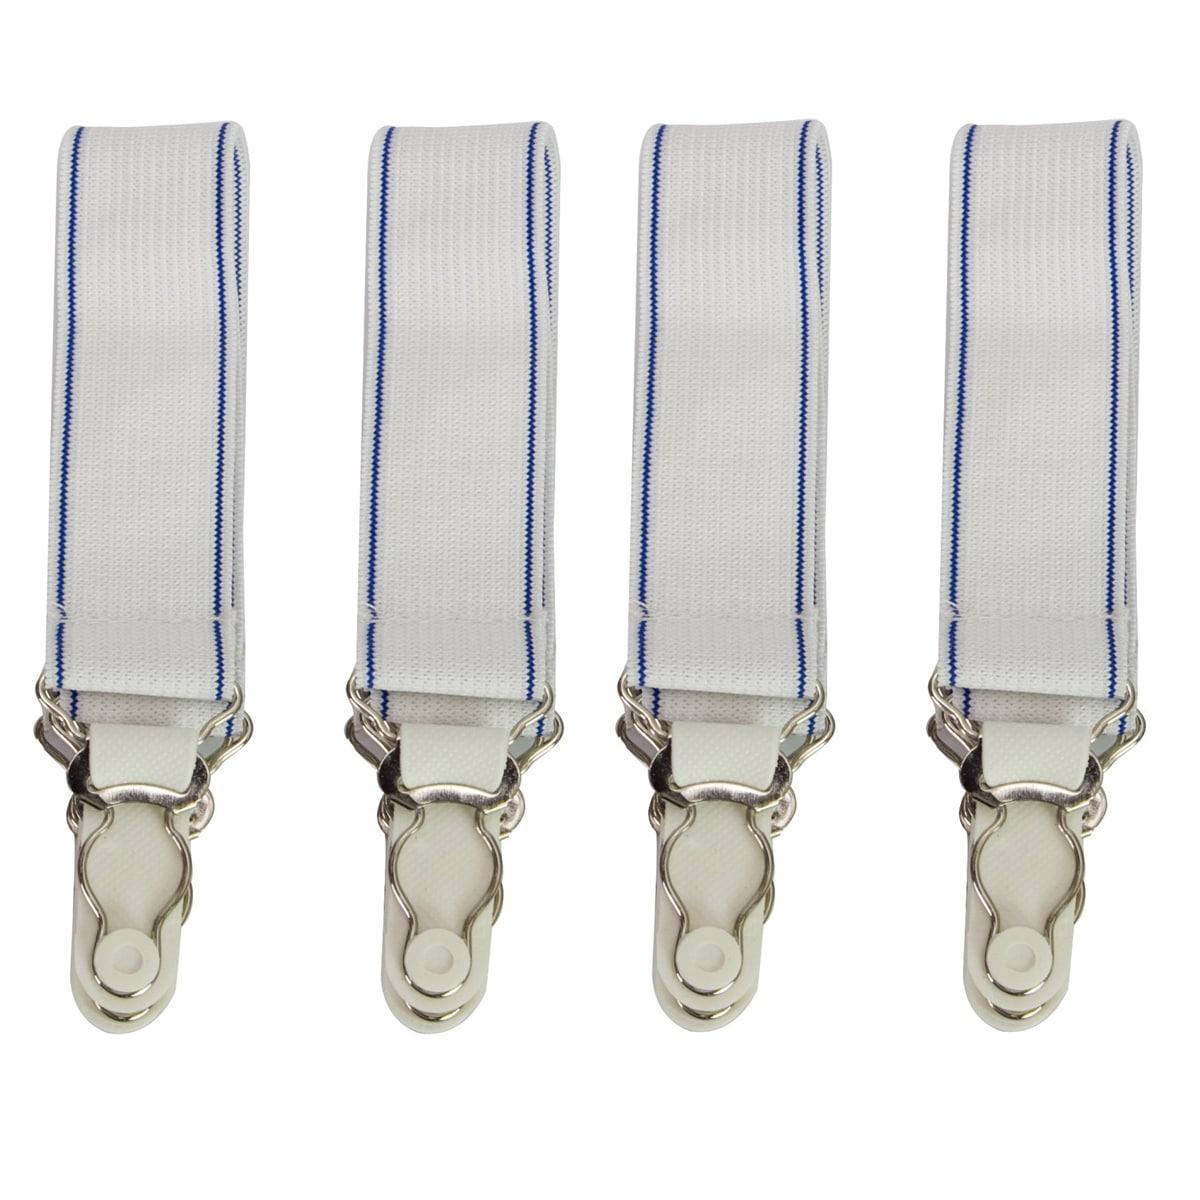 Elastic Sheet Straps (Set of 4) (4 pack), White (Syntheti...